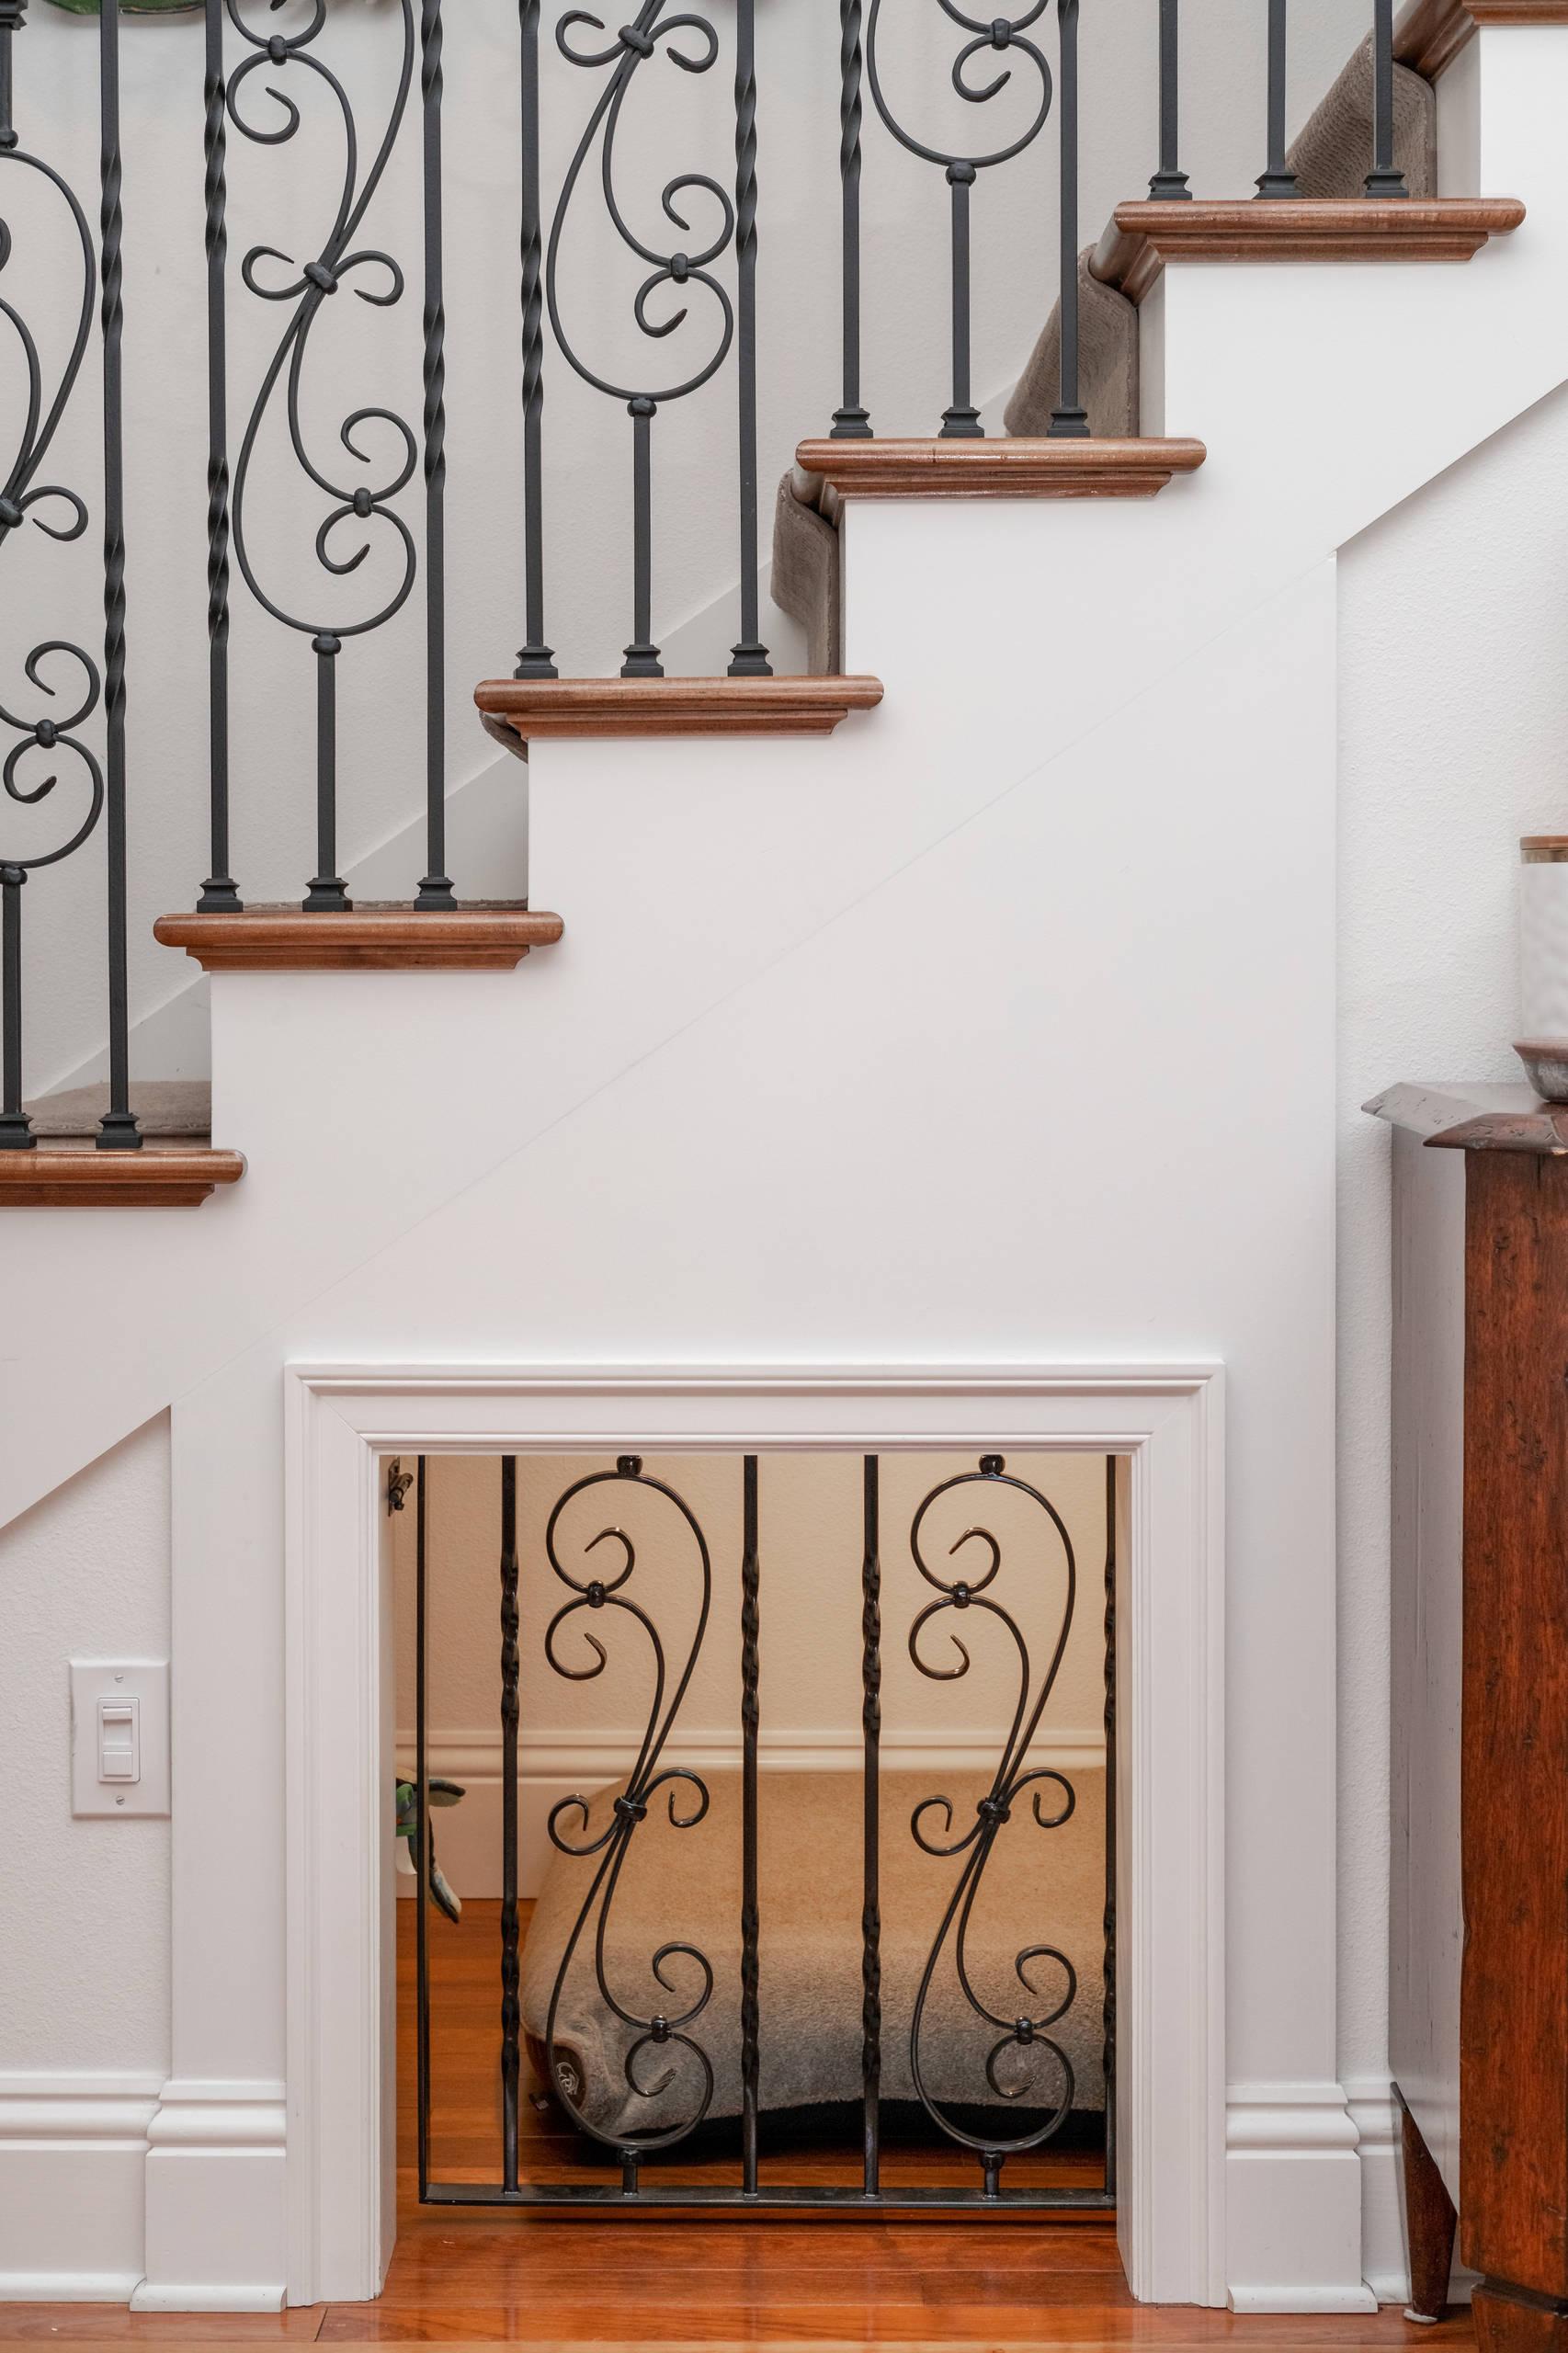 Siesta Key Woodworking + Deck